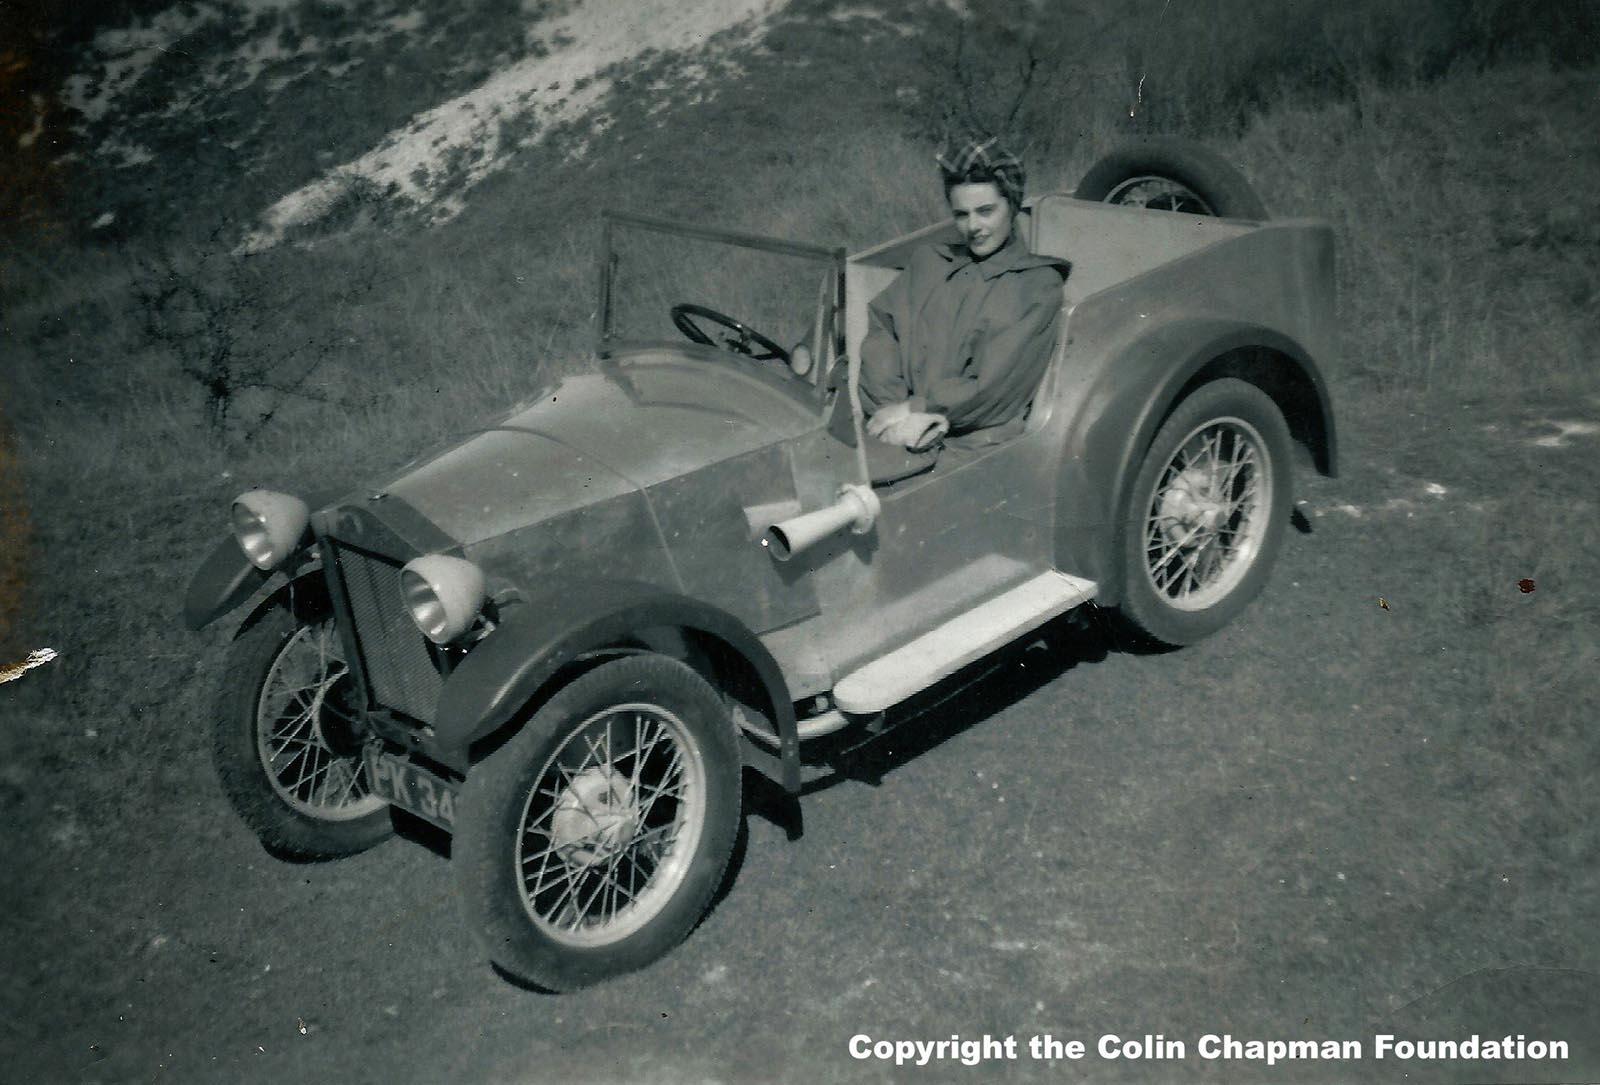 Photo of Ποια ήταν η πρώτη Lotus που κατασκευάστηκε ποτέ;